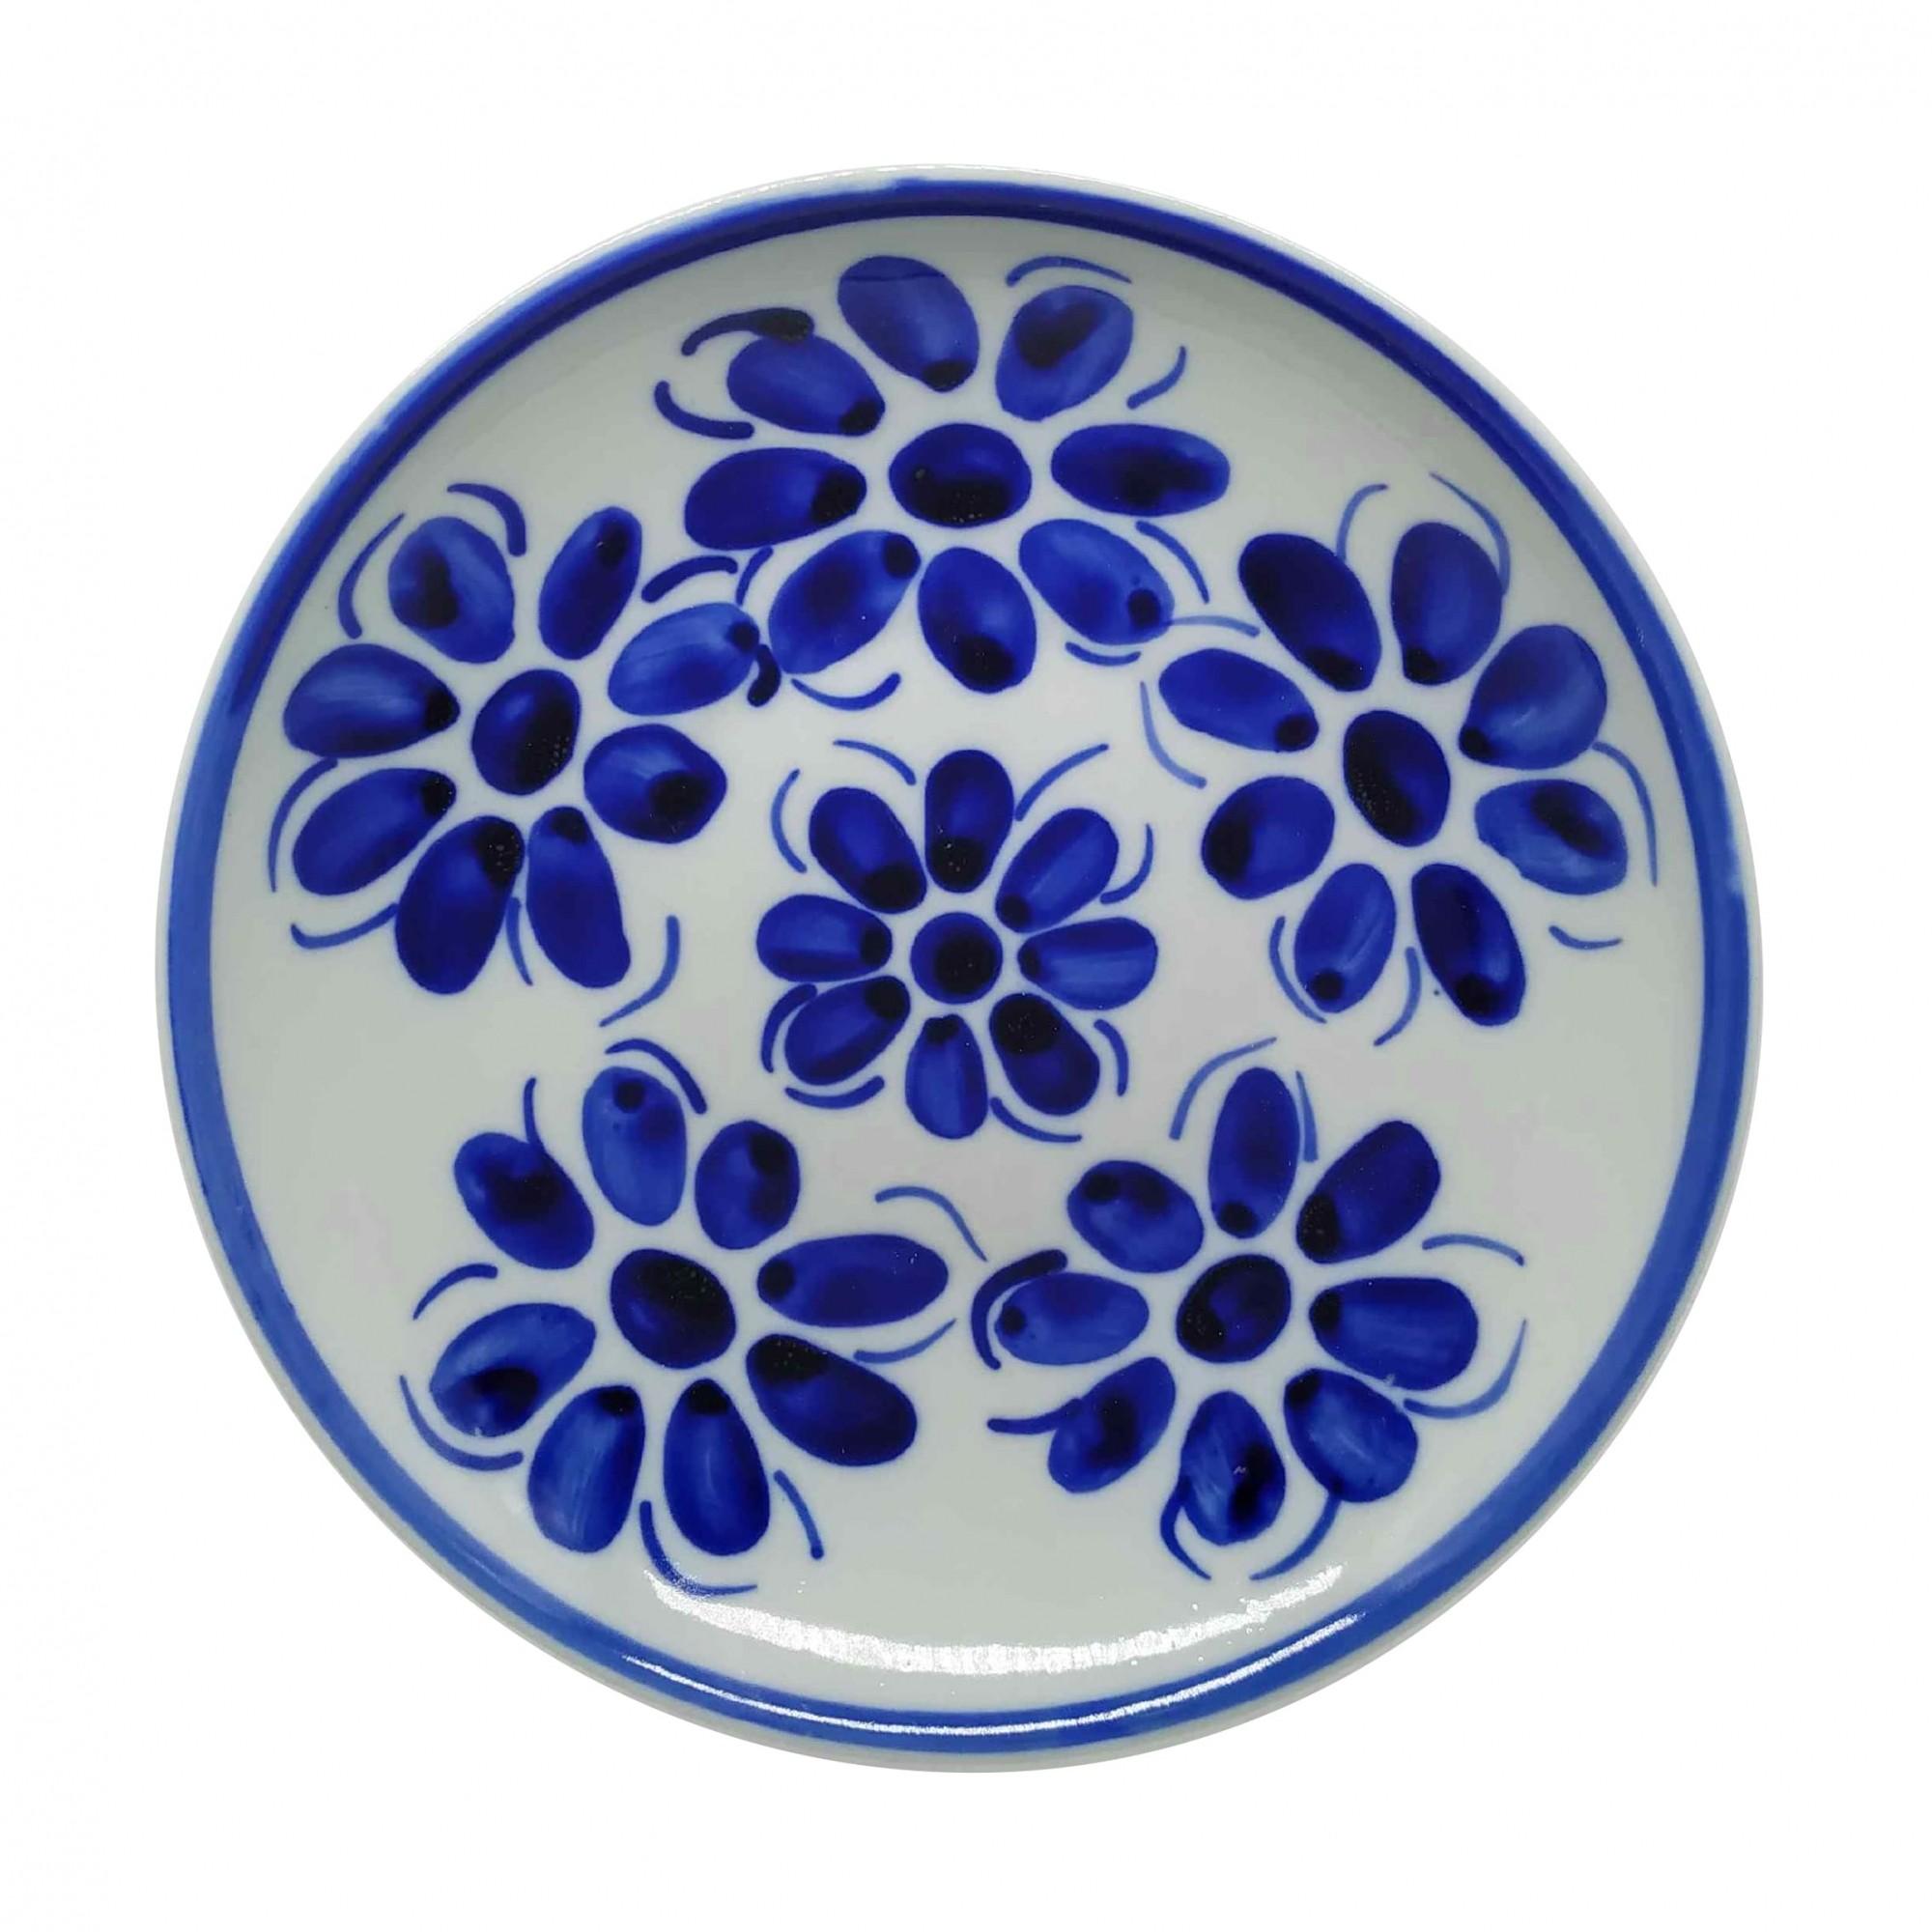 Prato Fundo 22,5 cm Porcelana Azul Vintage